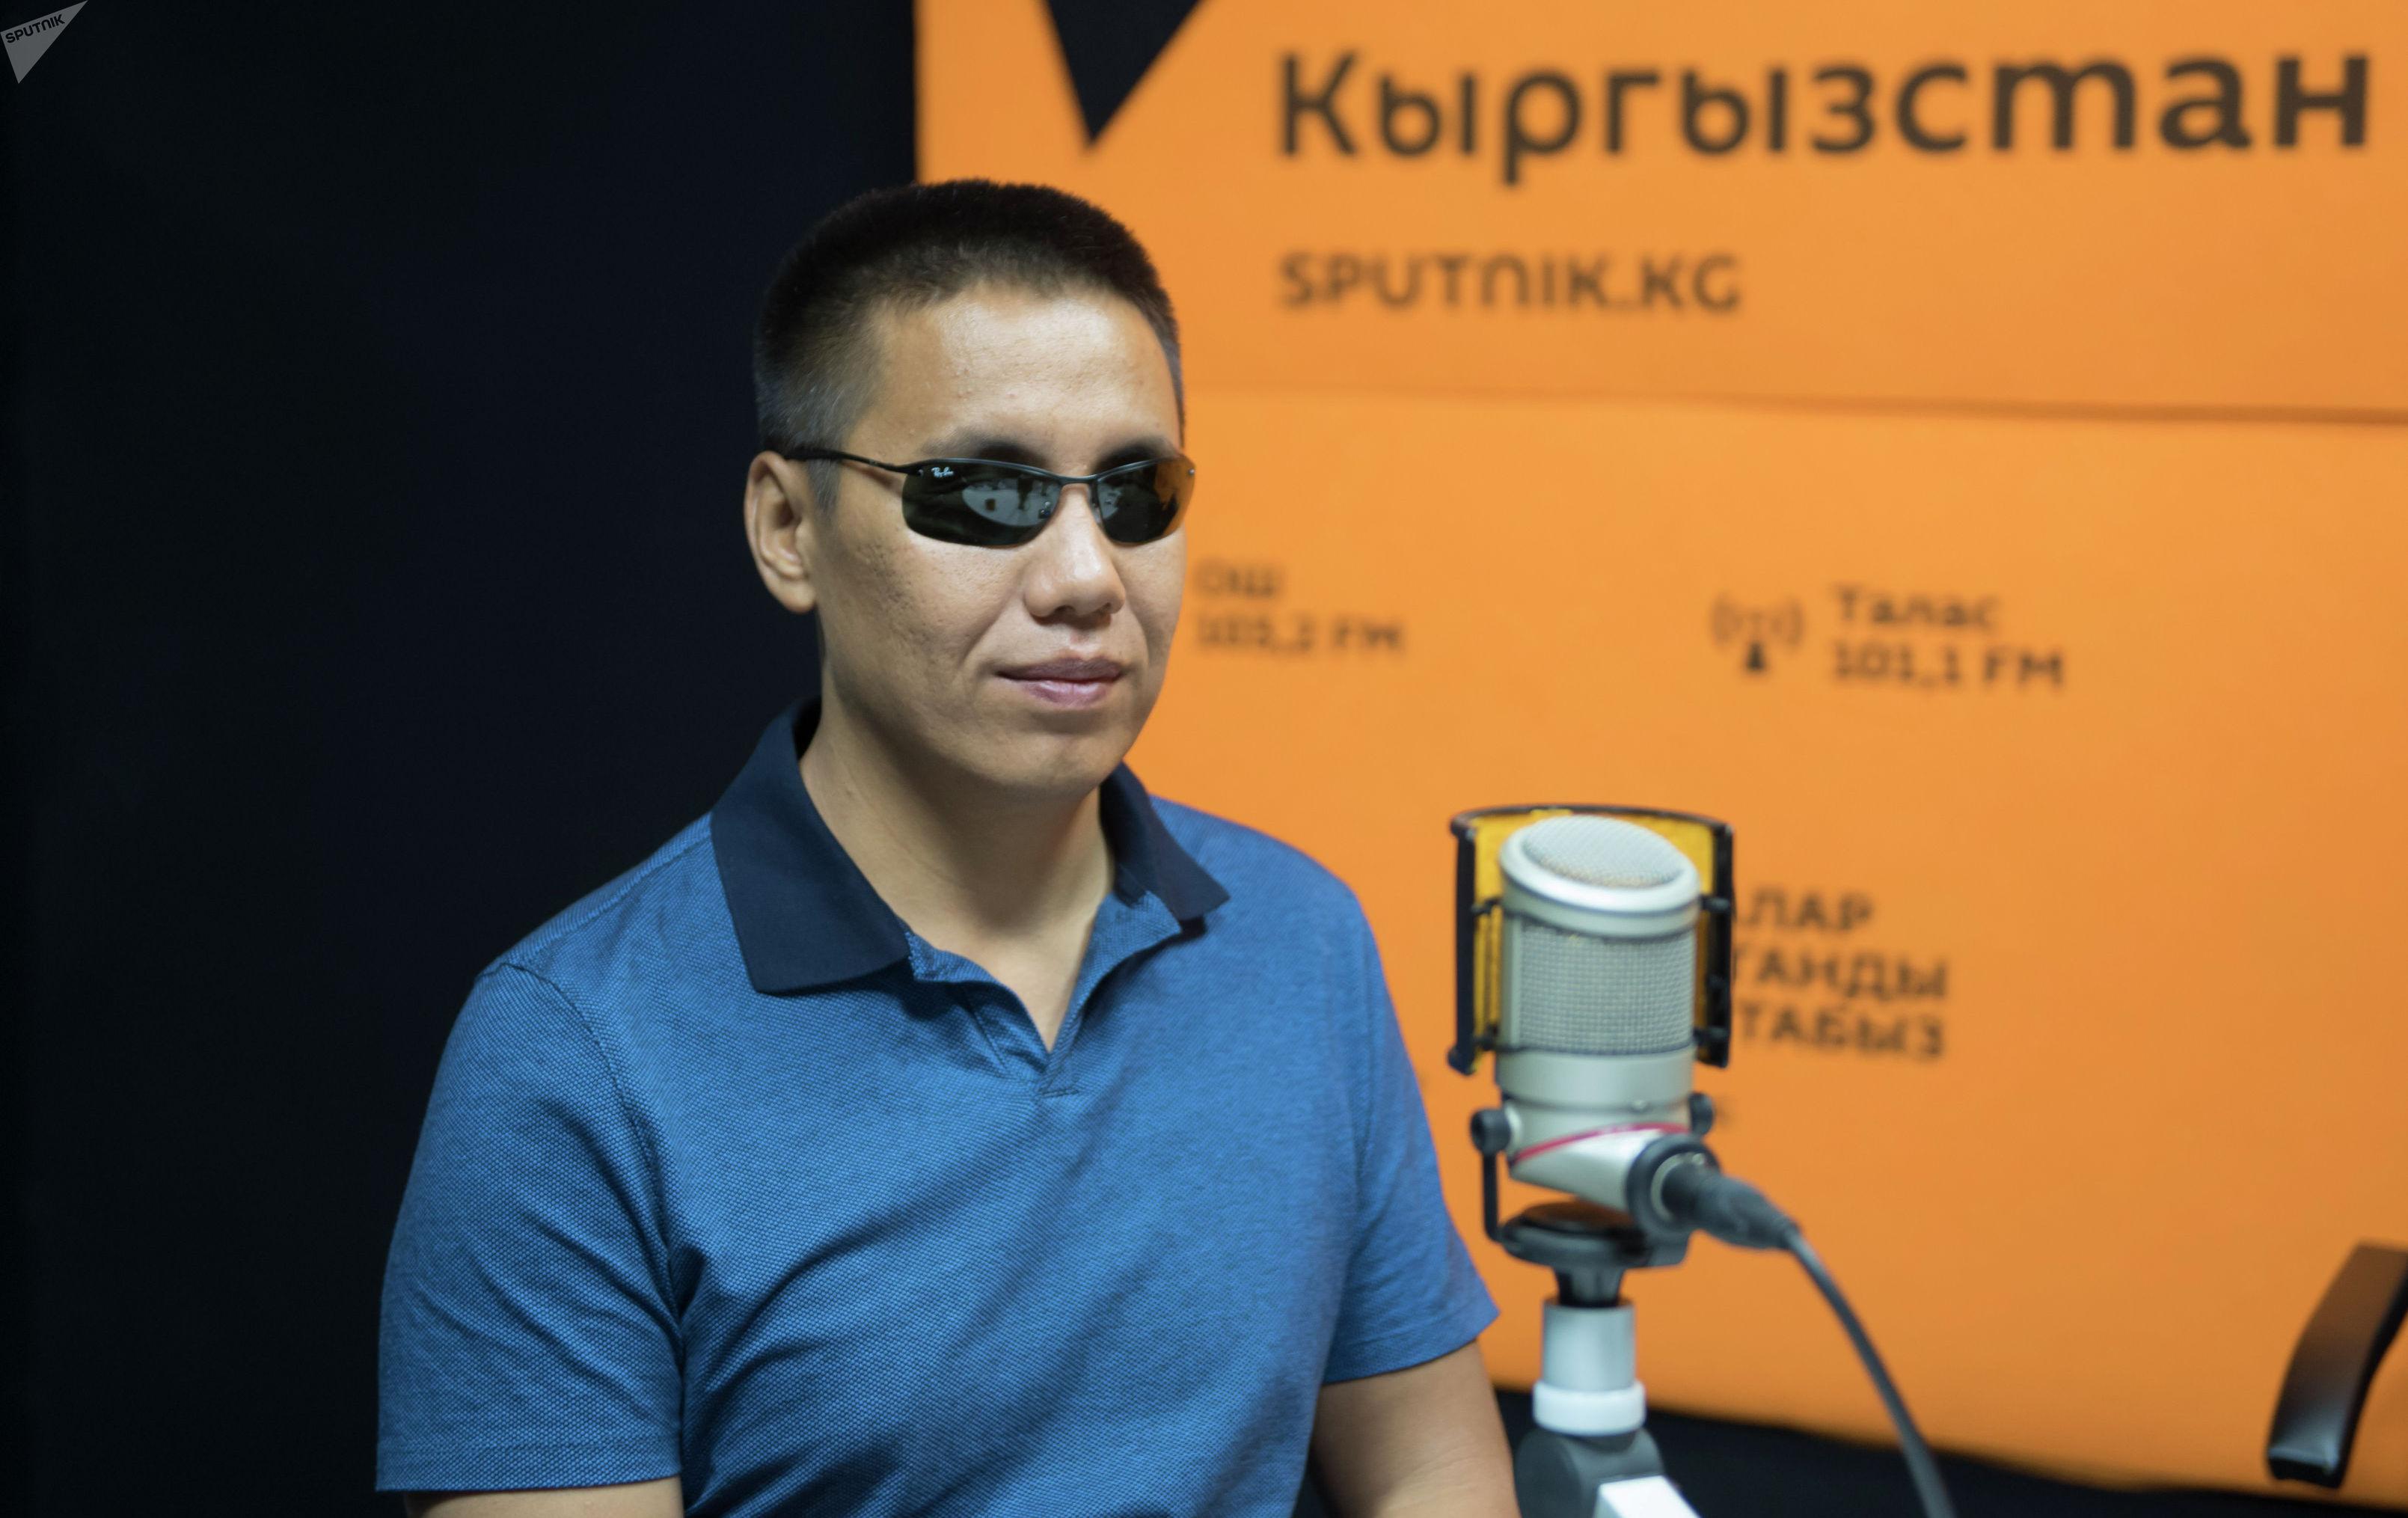 Депутат Жогорку Кенеша Дастан Бекешев во время интервью